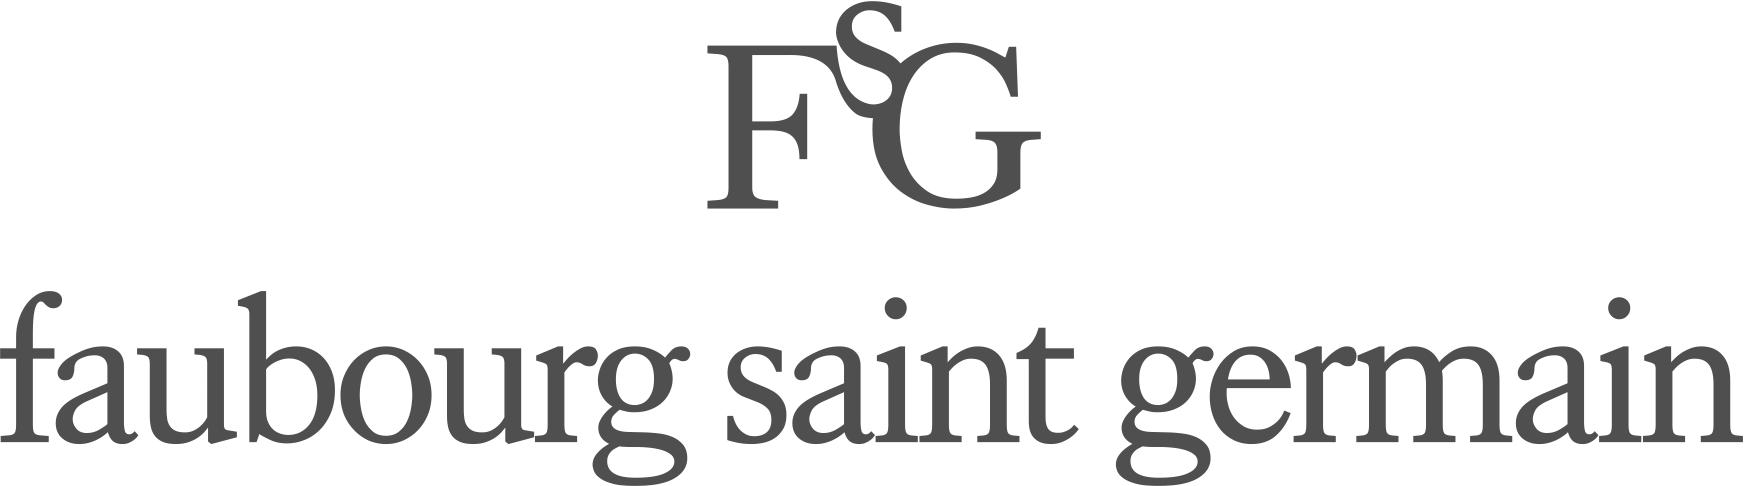 fsg ltd- company logo